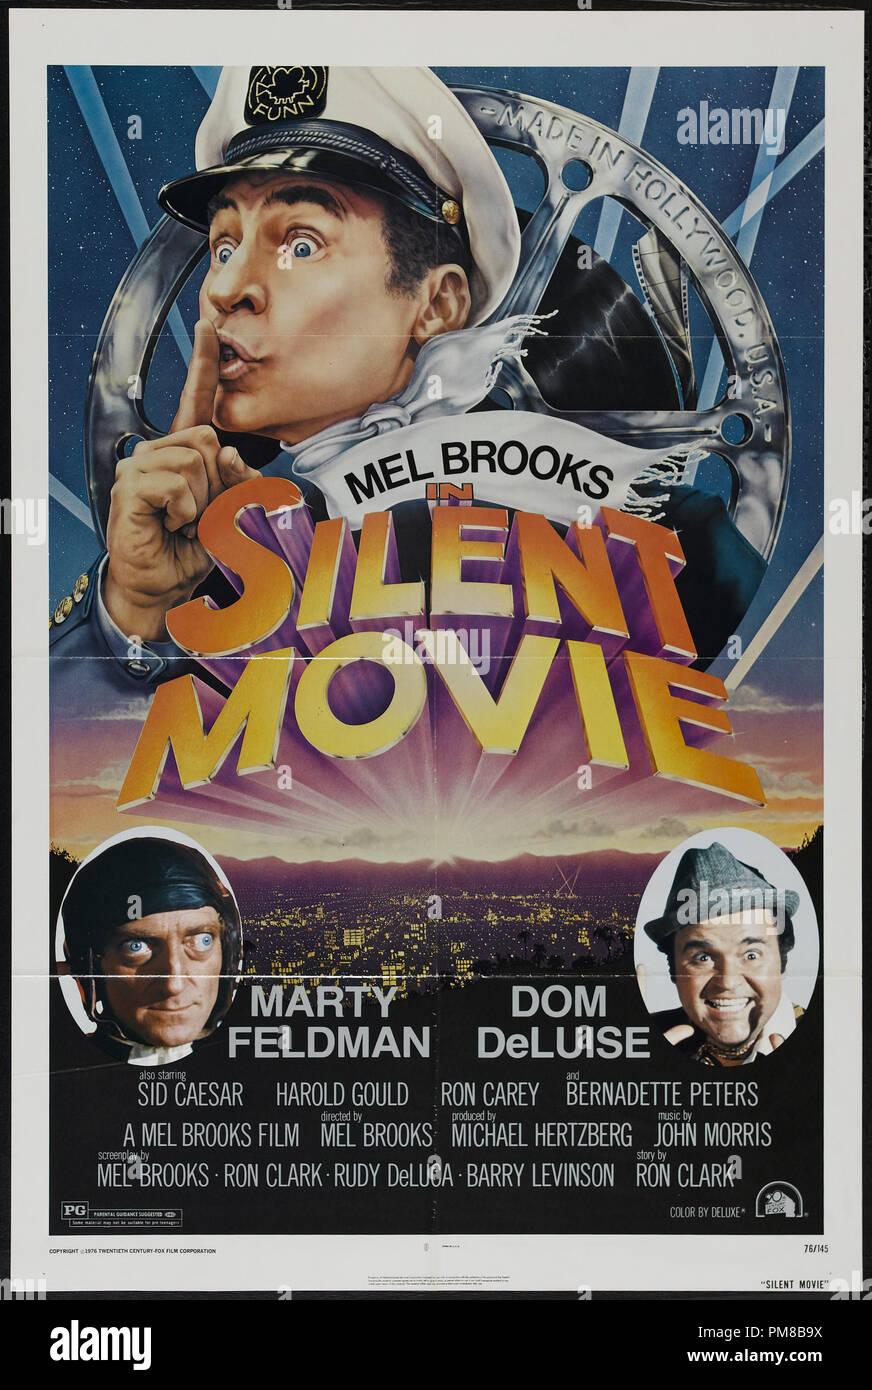 Studio Publicity Silent Movie 1976 20th Century Fox Poster Mel